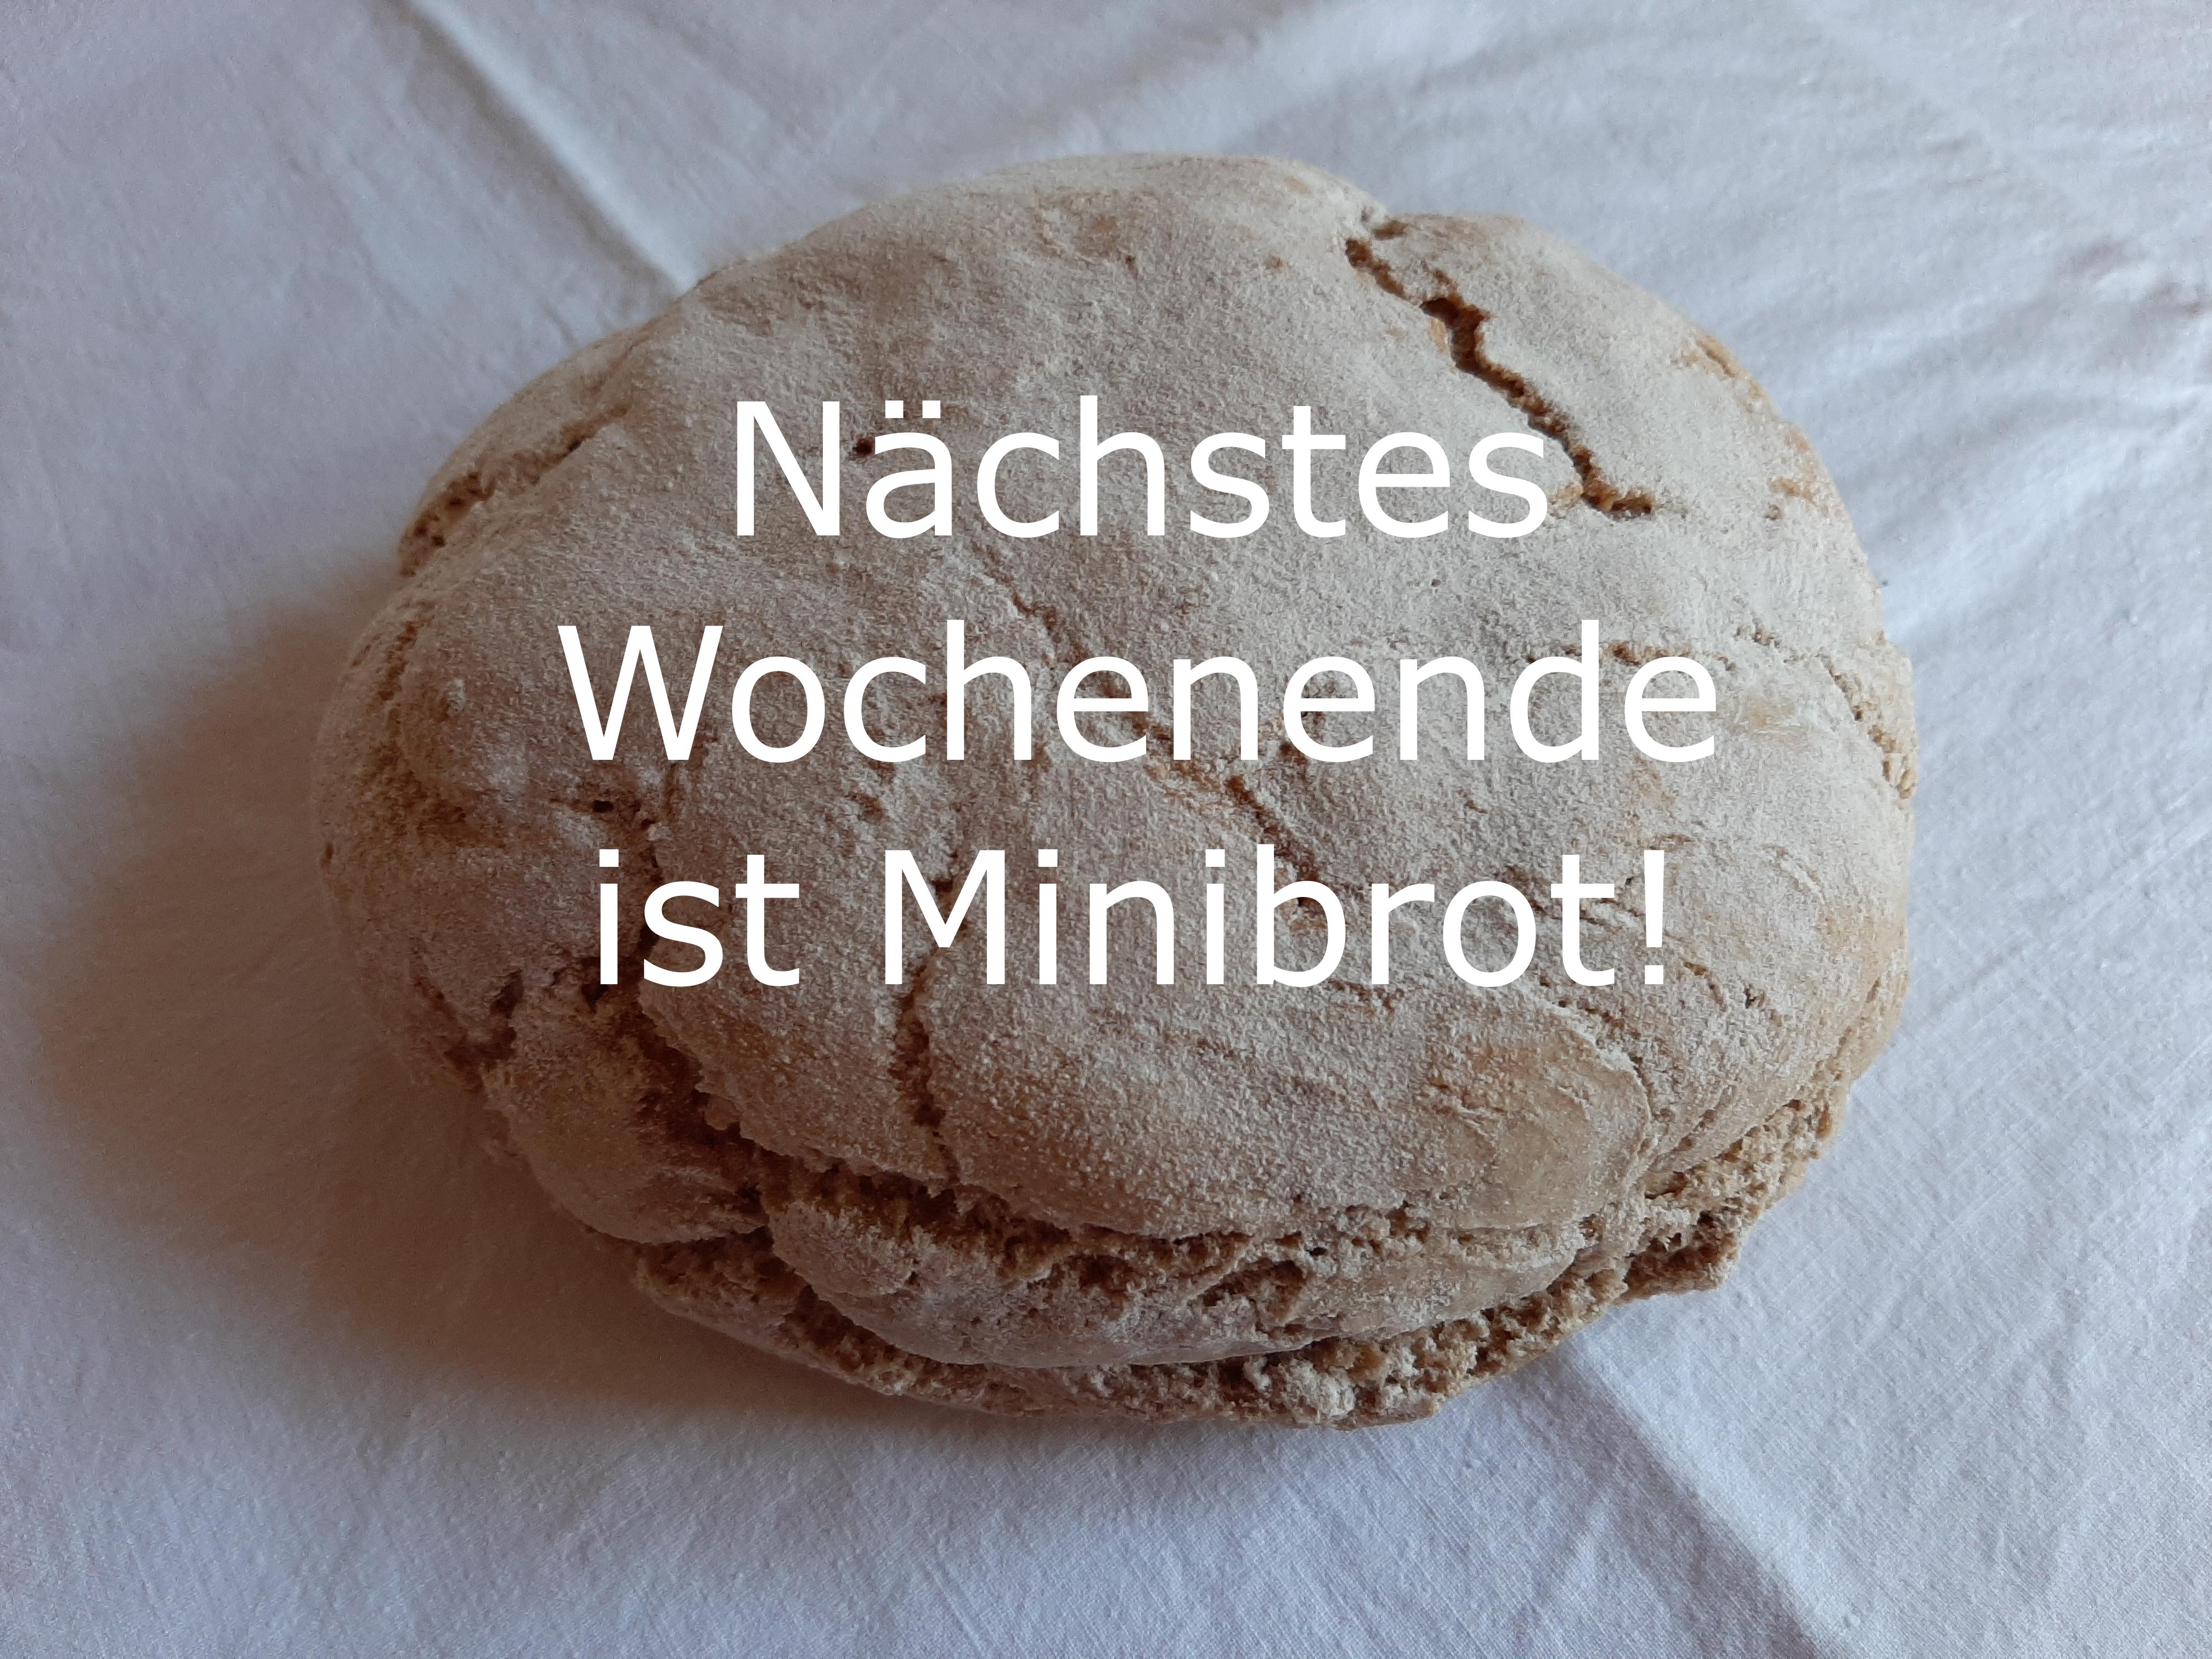 Minibrot